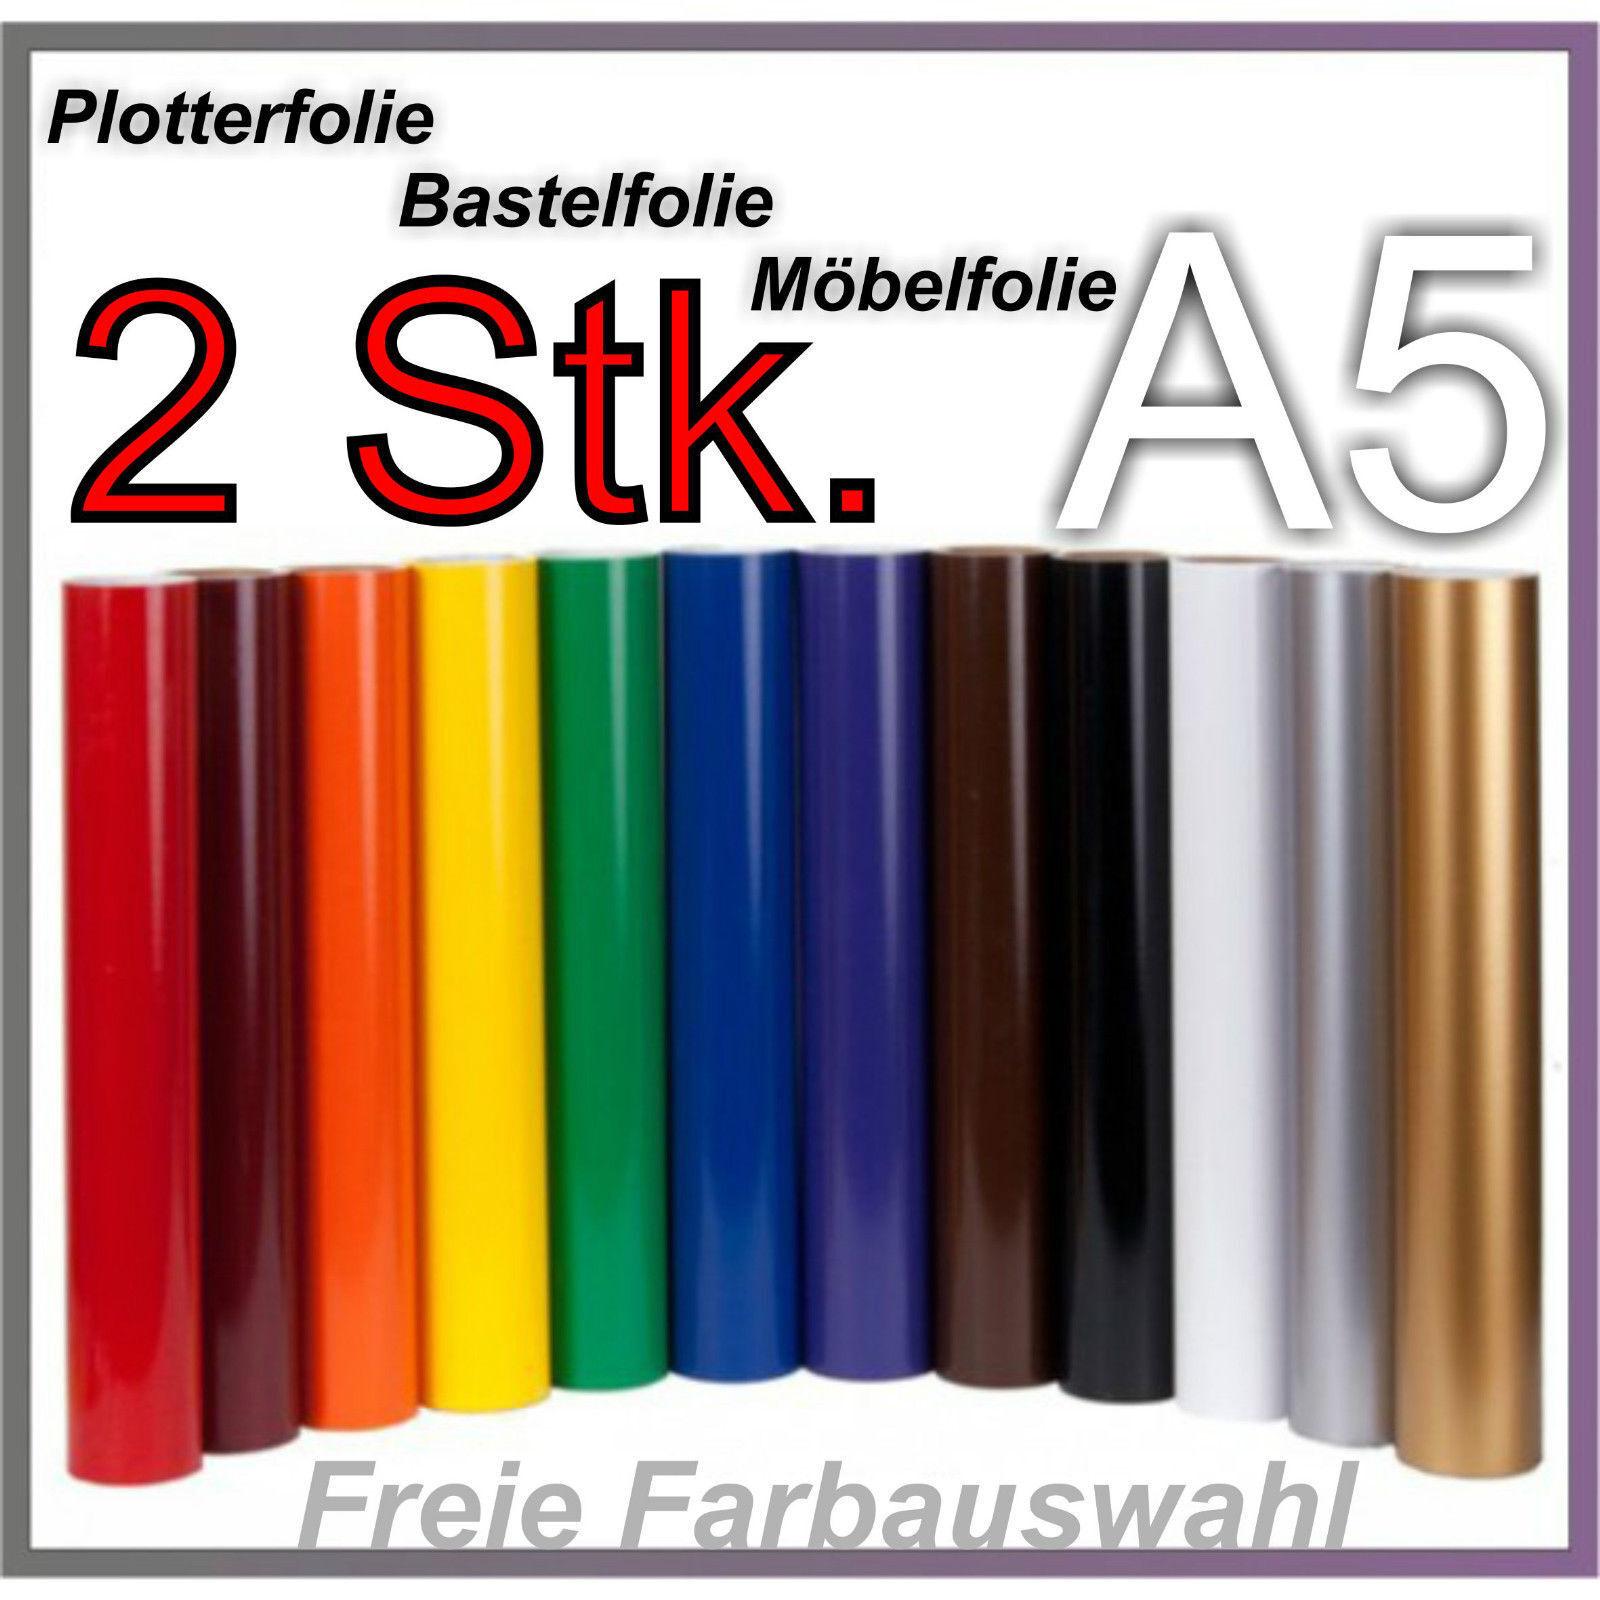 2x DIN A4 Bastelfolie Möbelfolie Folie Plotterfolie Klebefolie z.B Hellblau